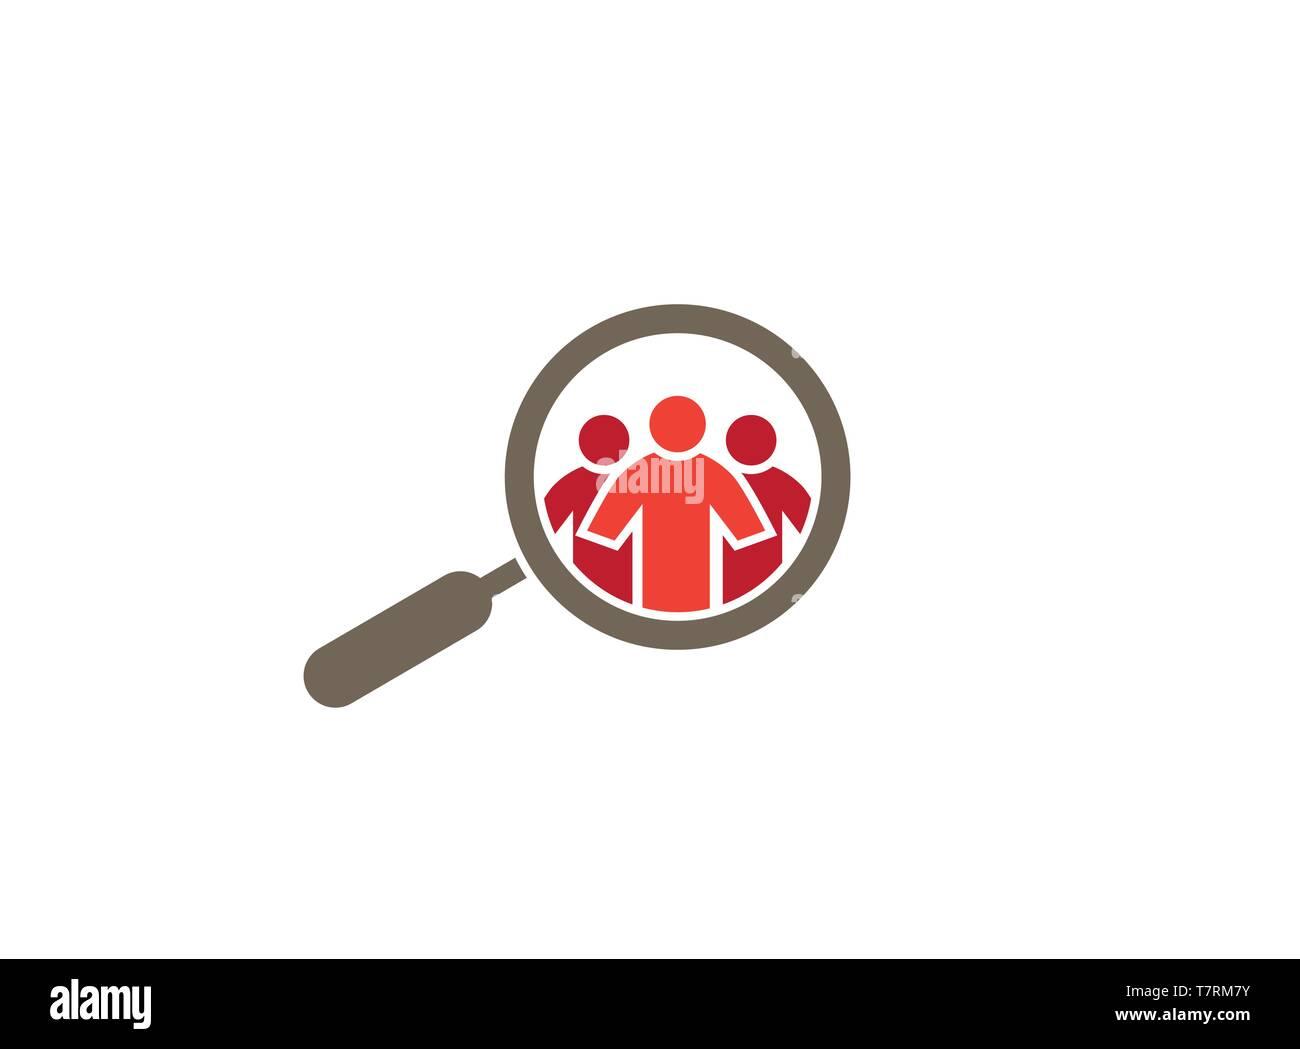 Loupe Spy on Peaple for logo - Stock Image